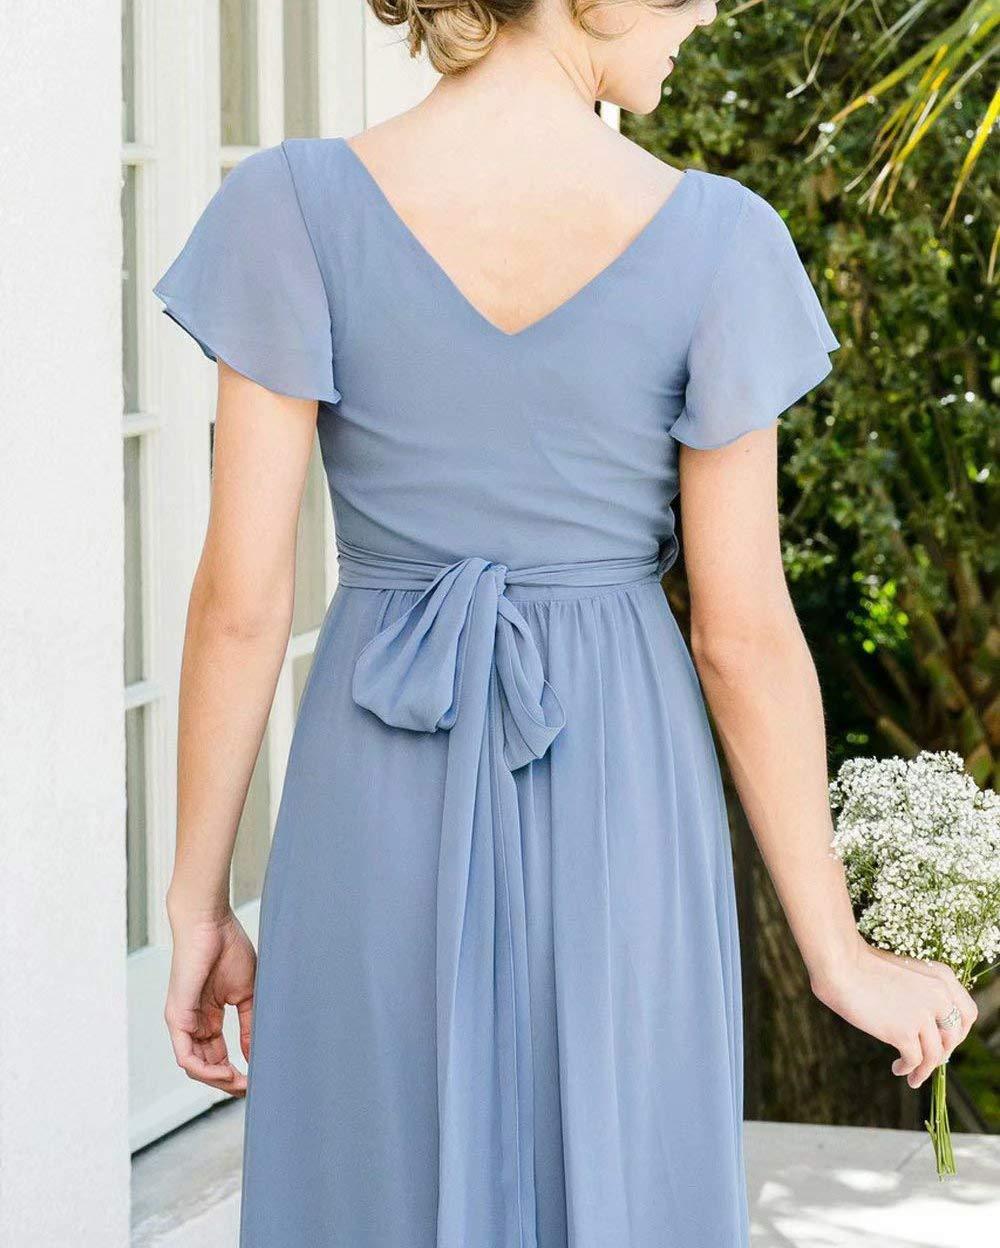 4d79e10e56a0 ElenaDressy Modest Short Sleeves Chiffon Bridesmaid Dresses 2019 ...